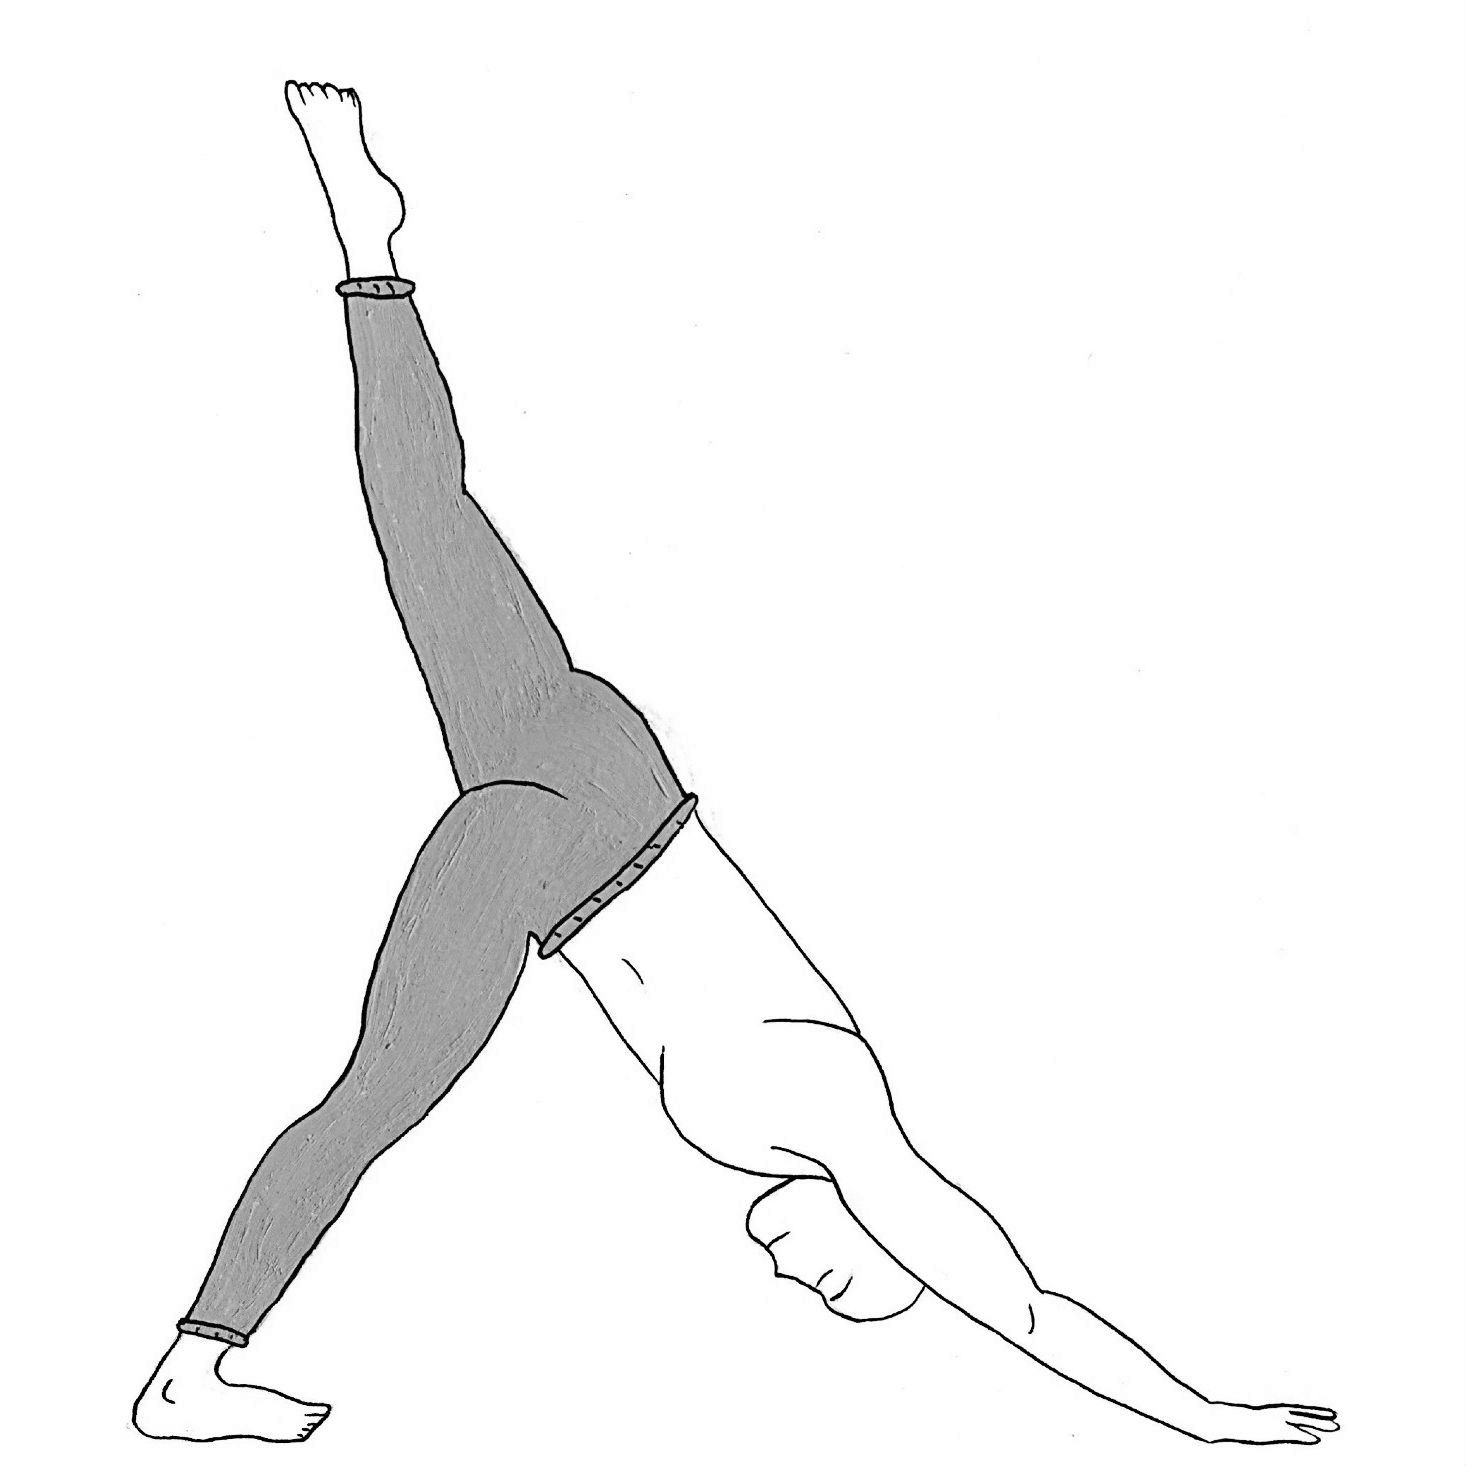 One-Legged Downward Facing Dog - Eka Pada Adho Mukha Svanasana